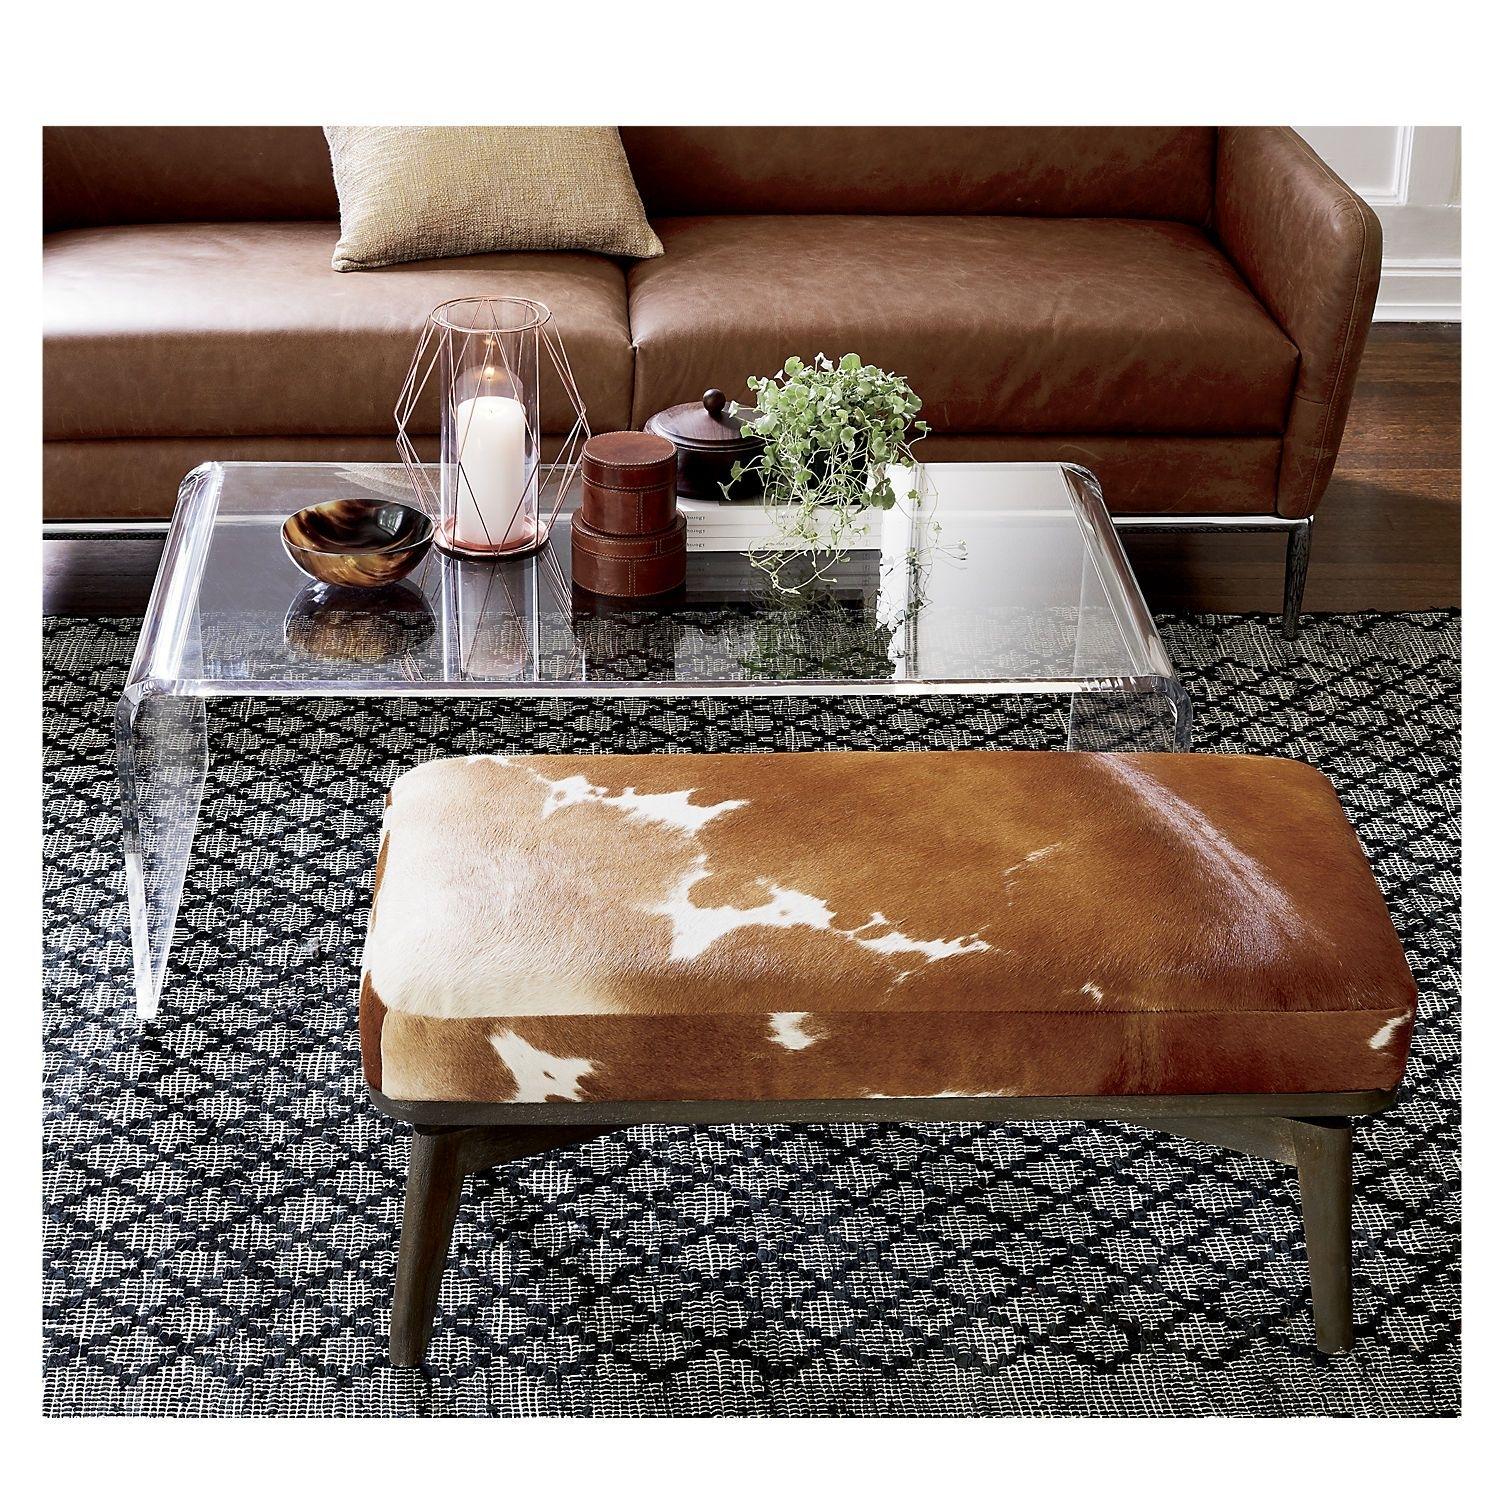 Peekaboo Acrylic Coffee Table | Style And More | Pinterest throughout Peekaboo Acrylic Tall Coffee Tables (Image 21 of 30)